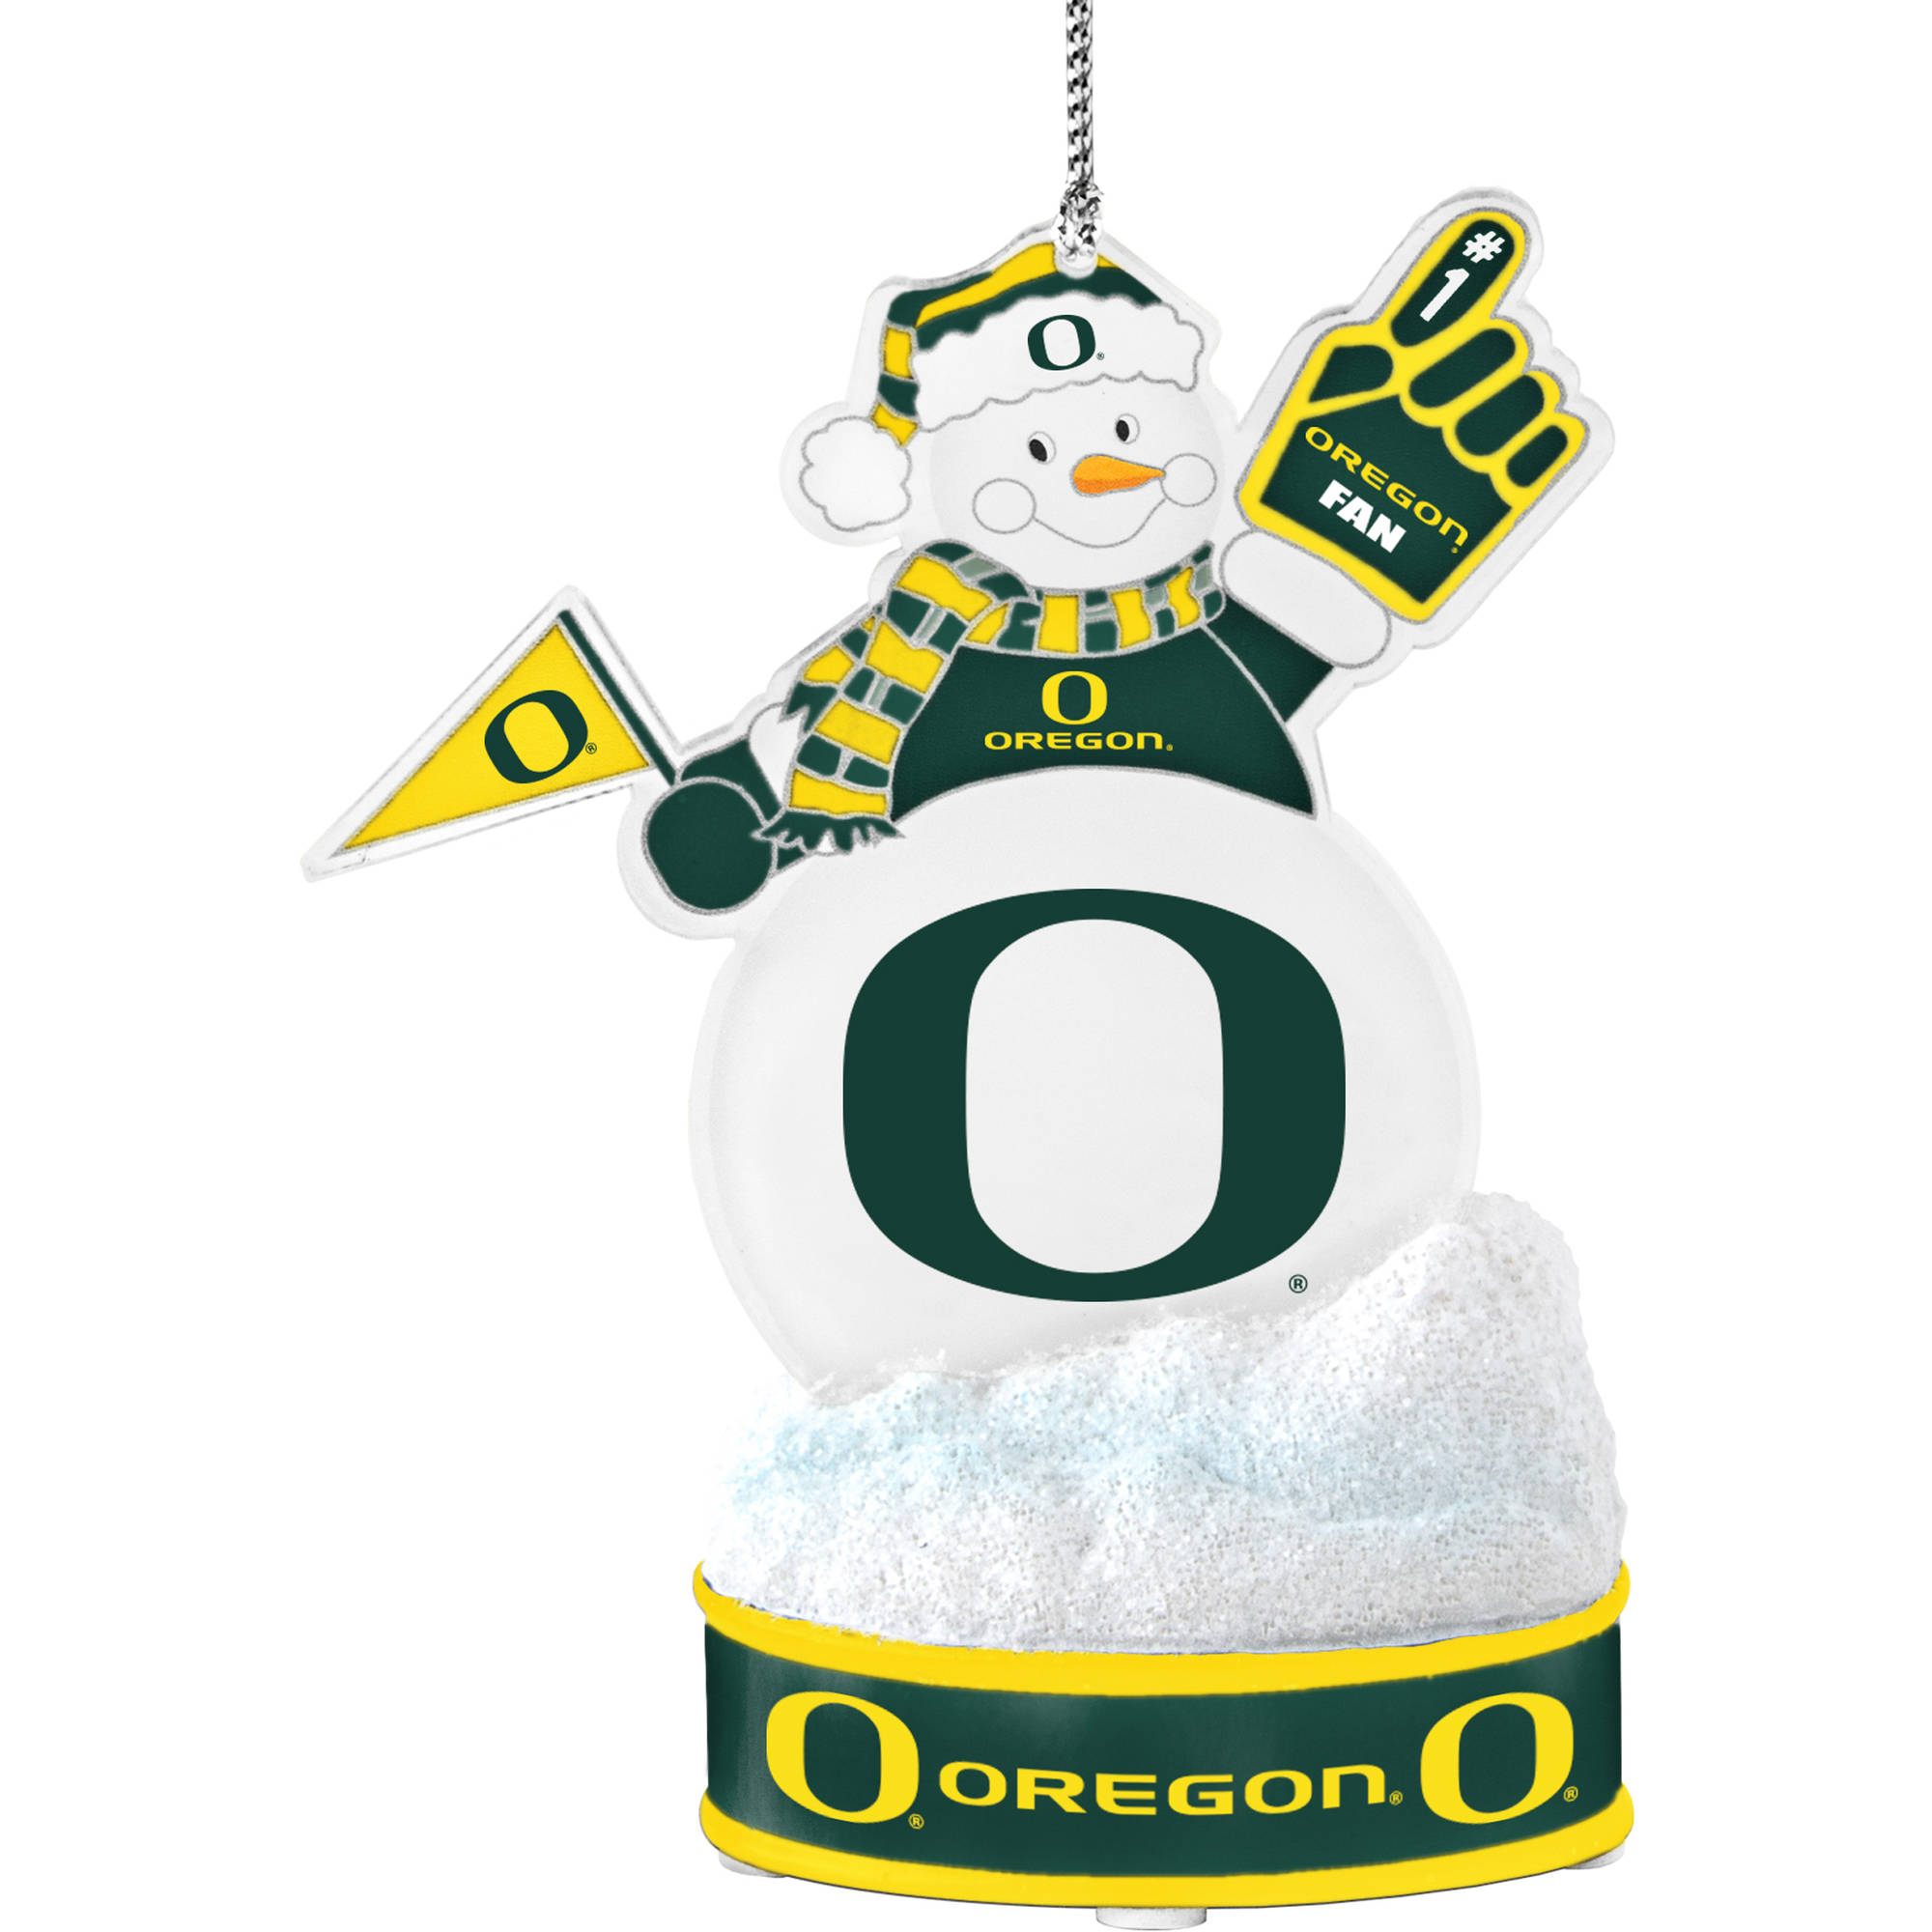 Topperscot by Boelter Brands NCAA LED Snowman Ornament, University of Oregon Ducks